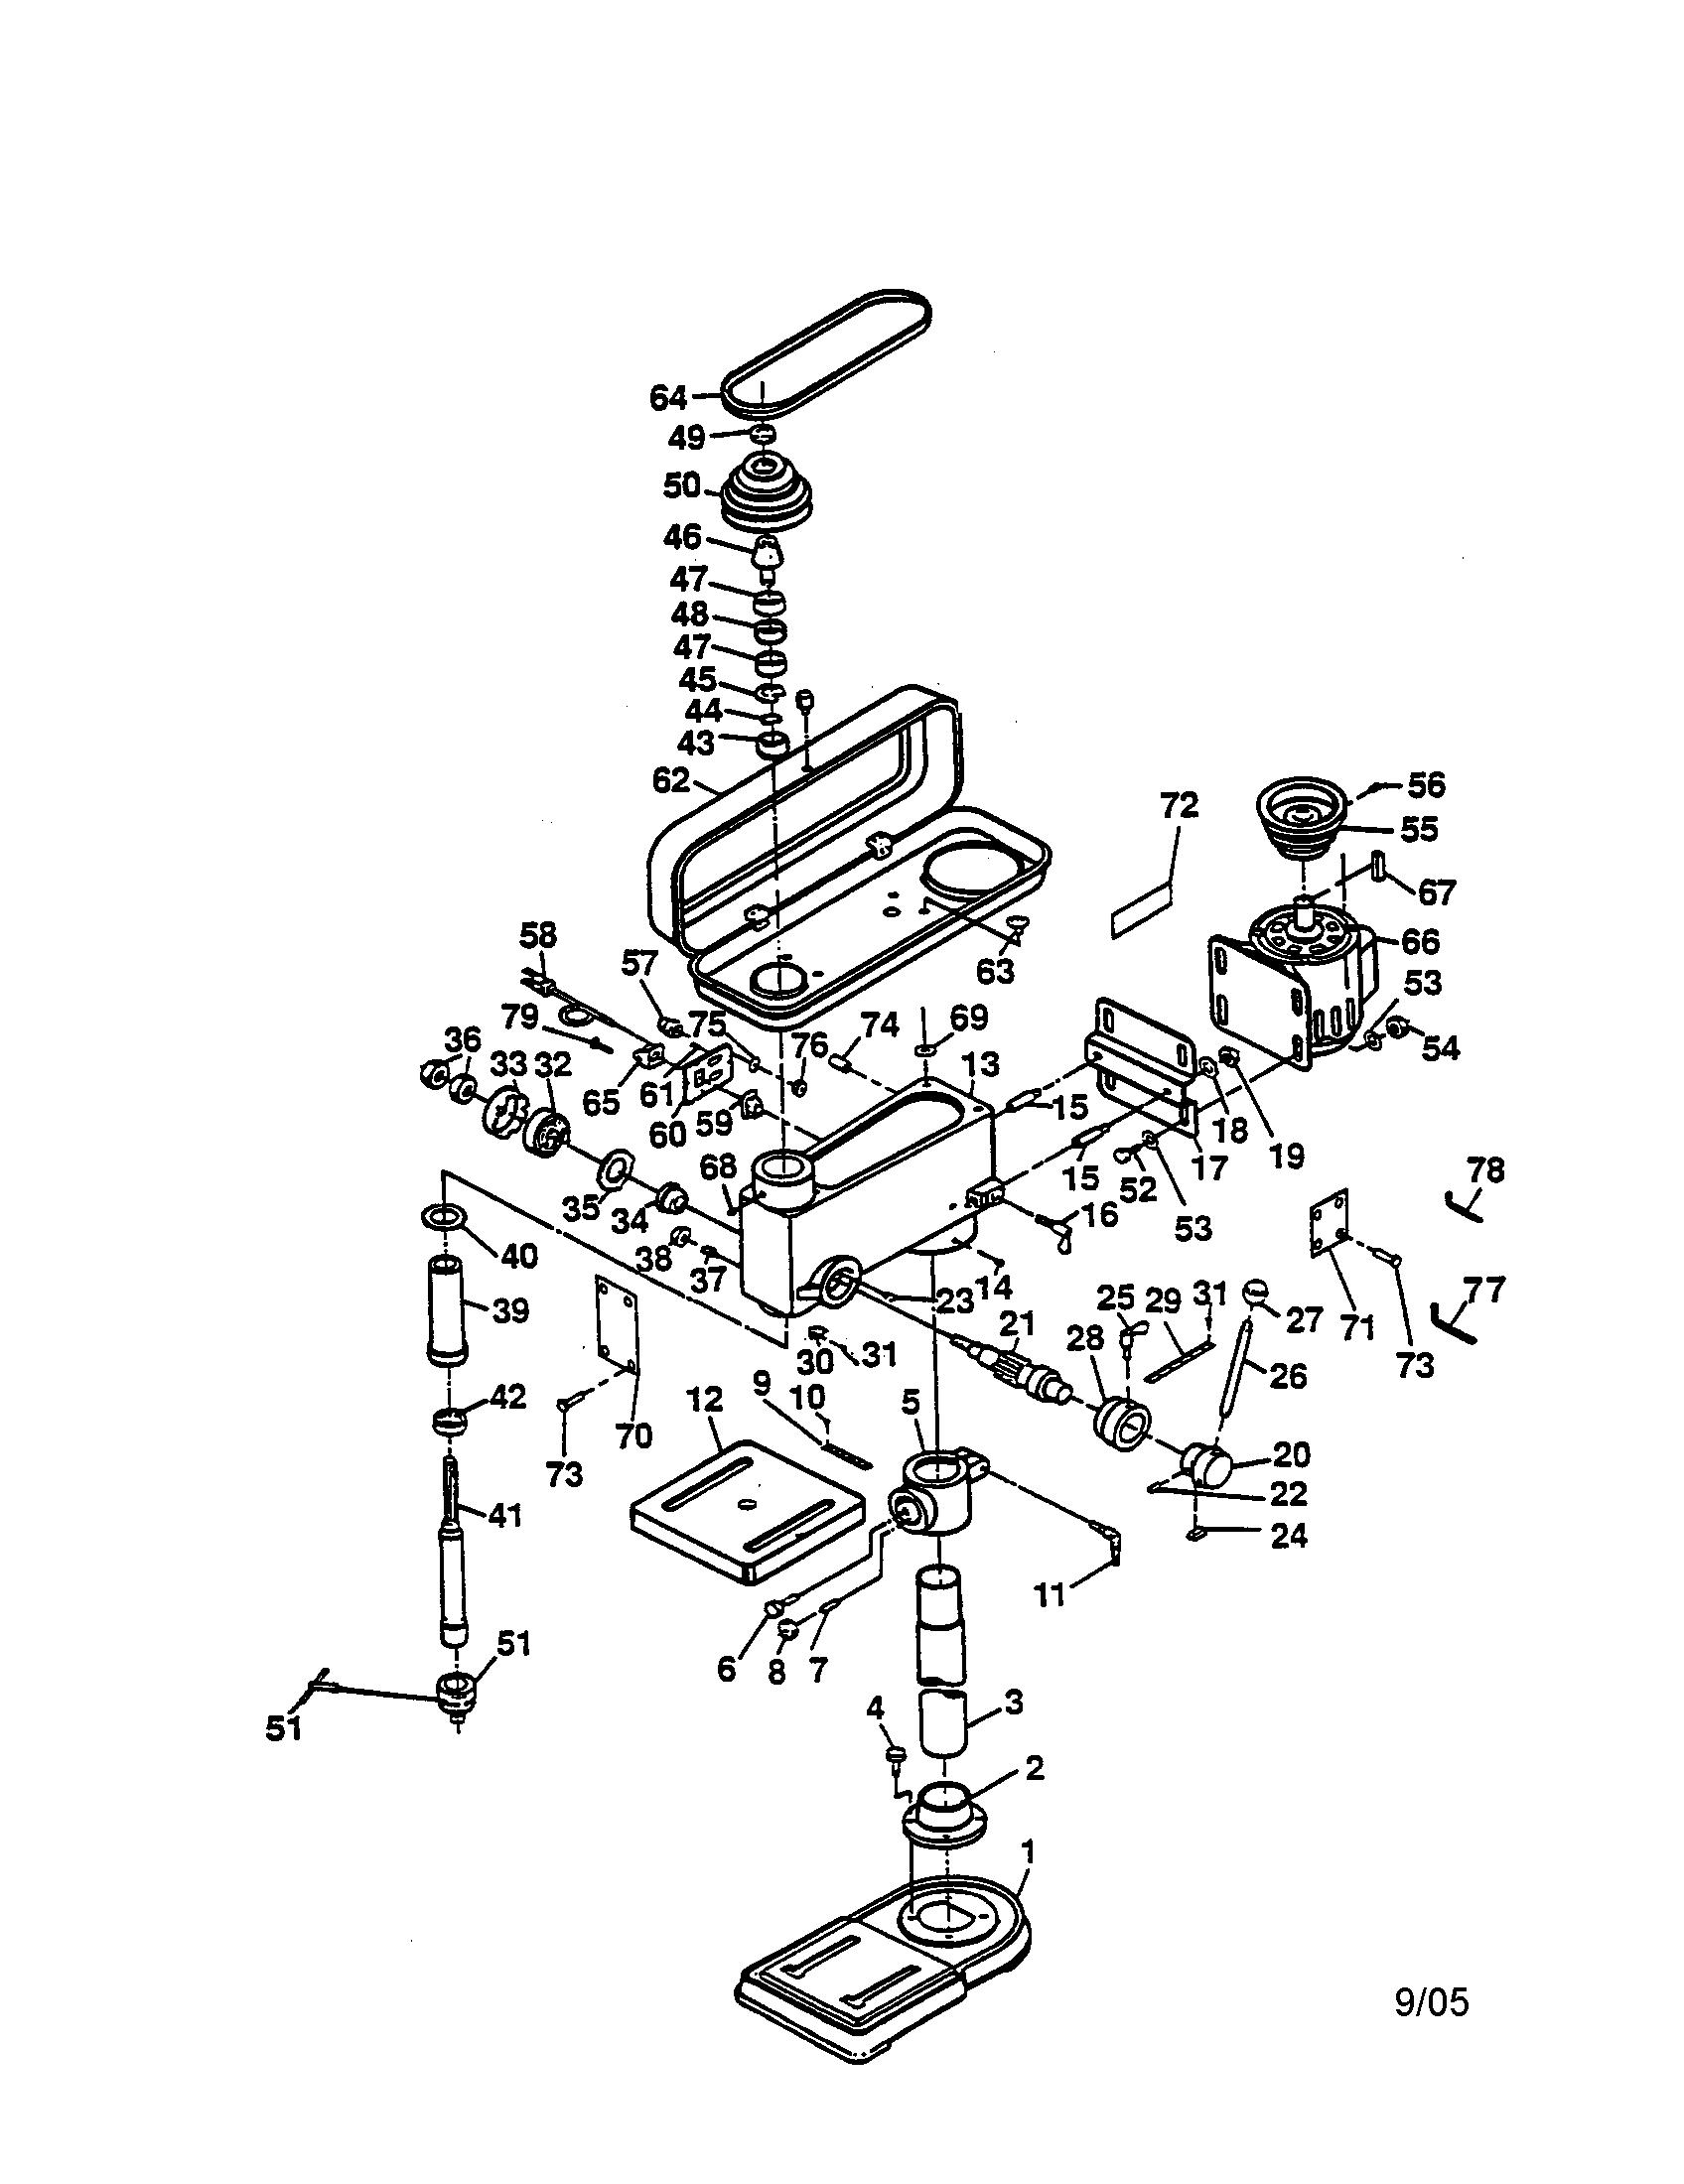 hight resolution of ryobi dp100 drill press diagram